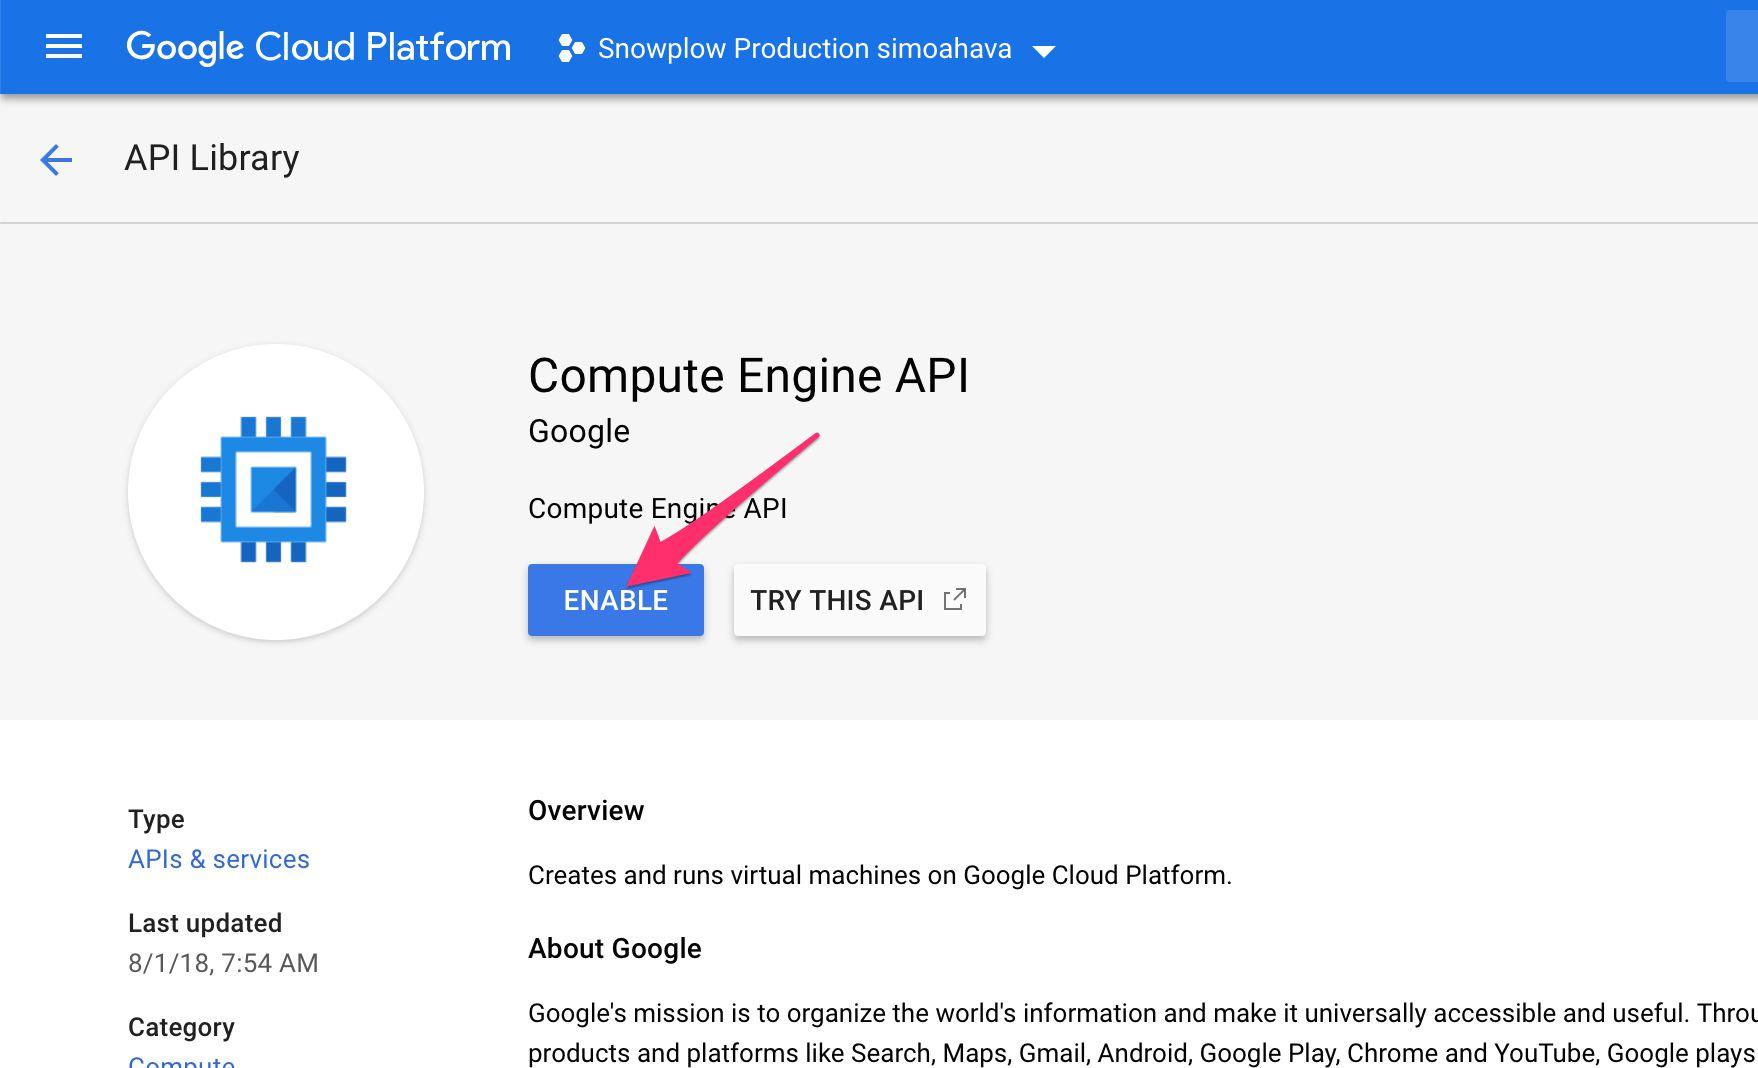 Install Snowplow On The Google Cloud Platform | Simo Ahava's